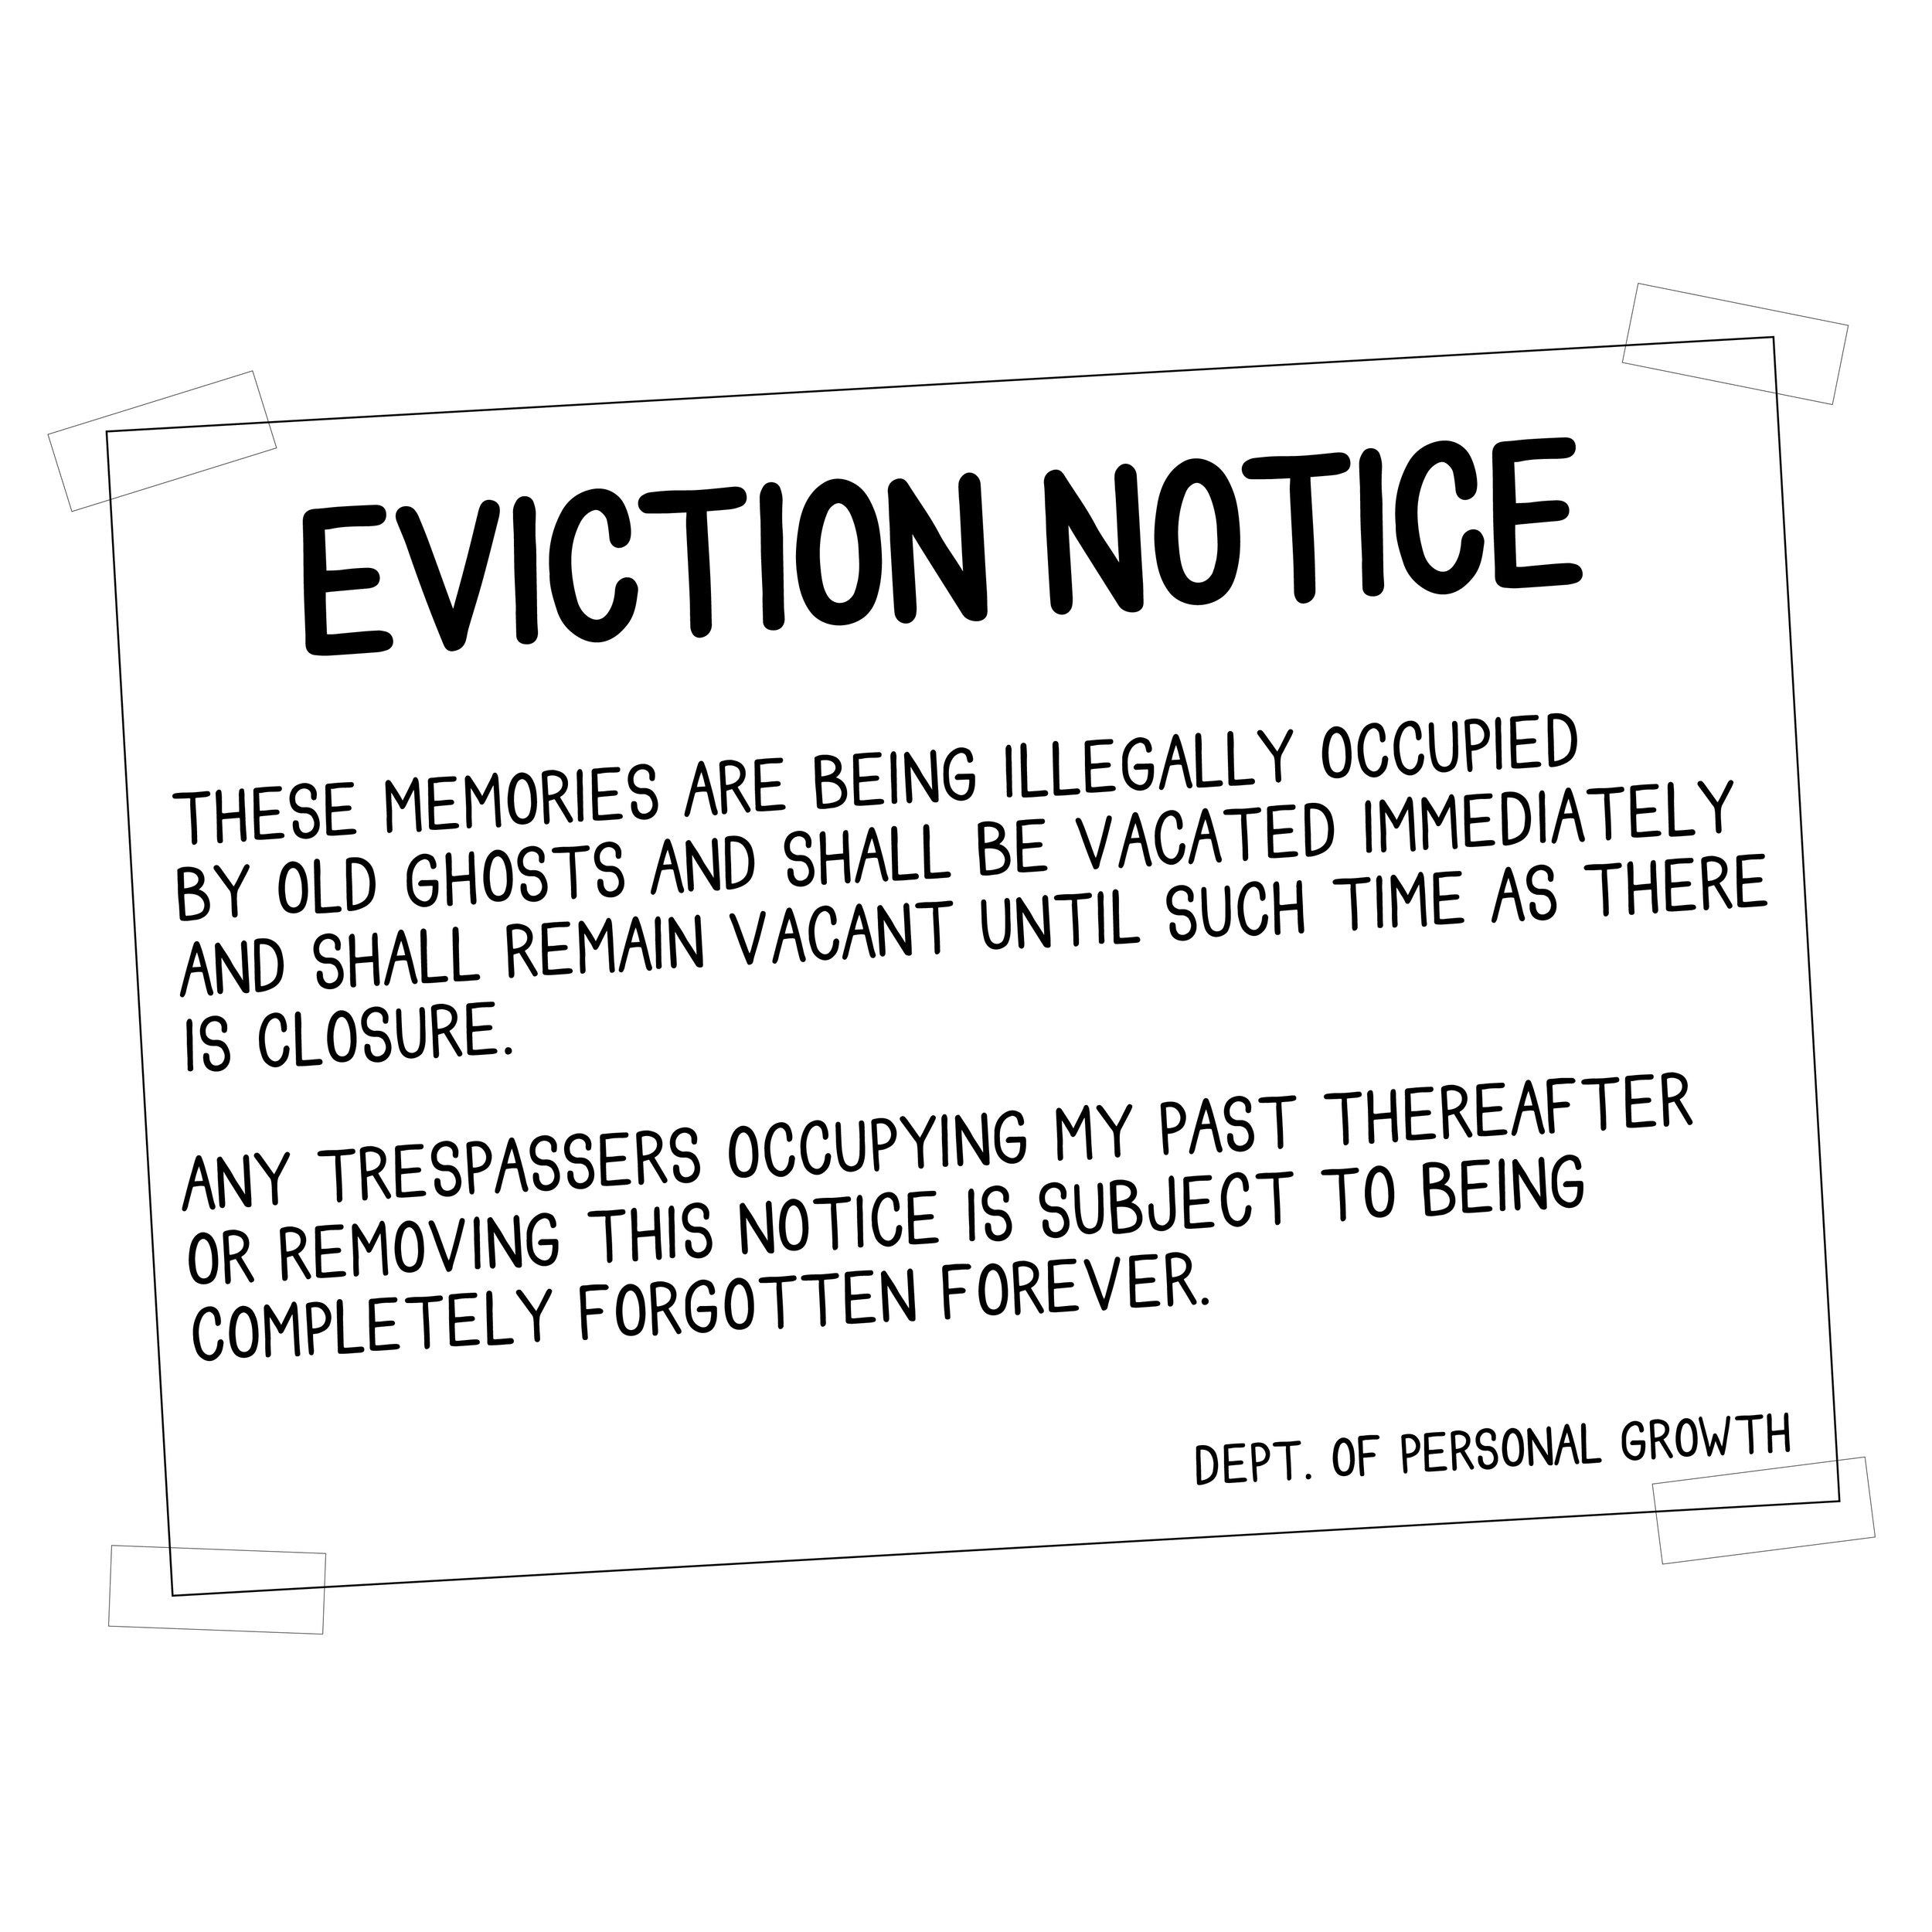 evictionnotice-01.jpg